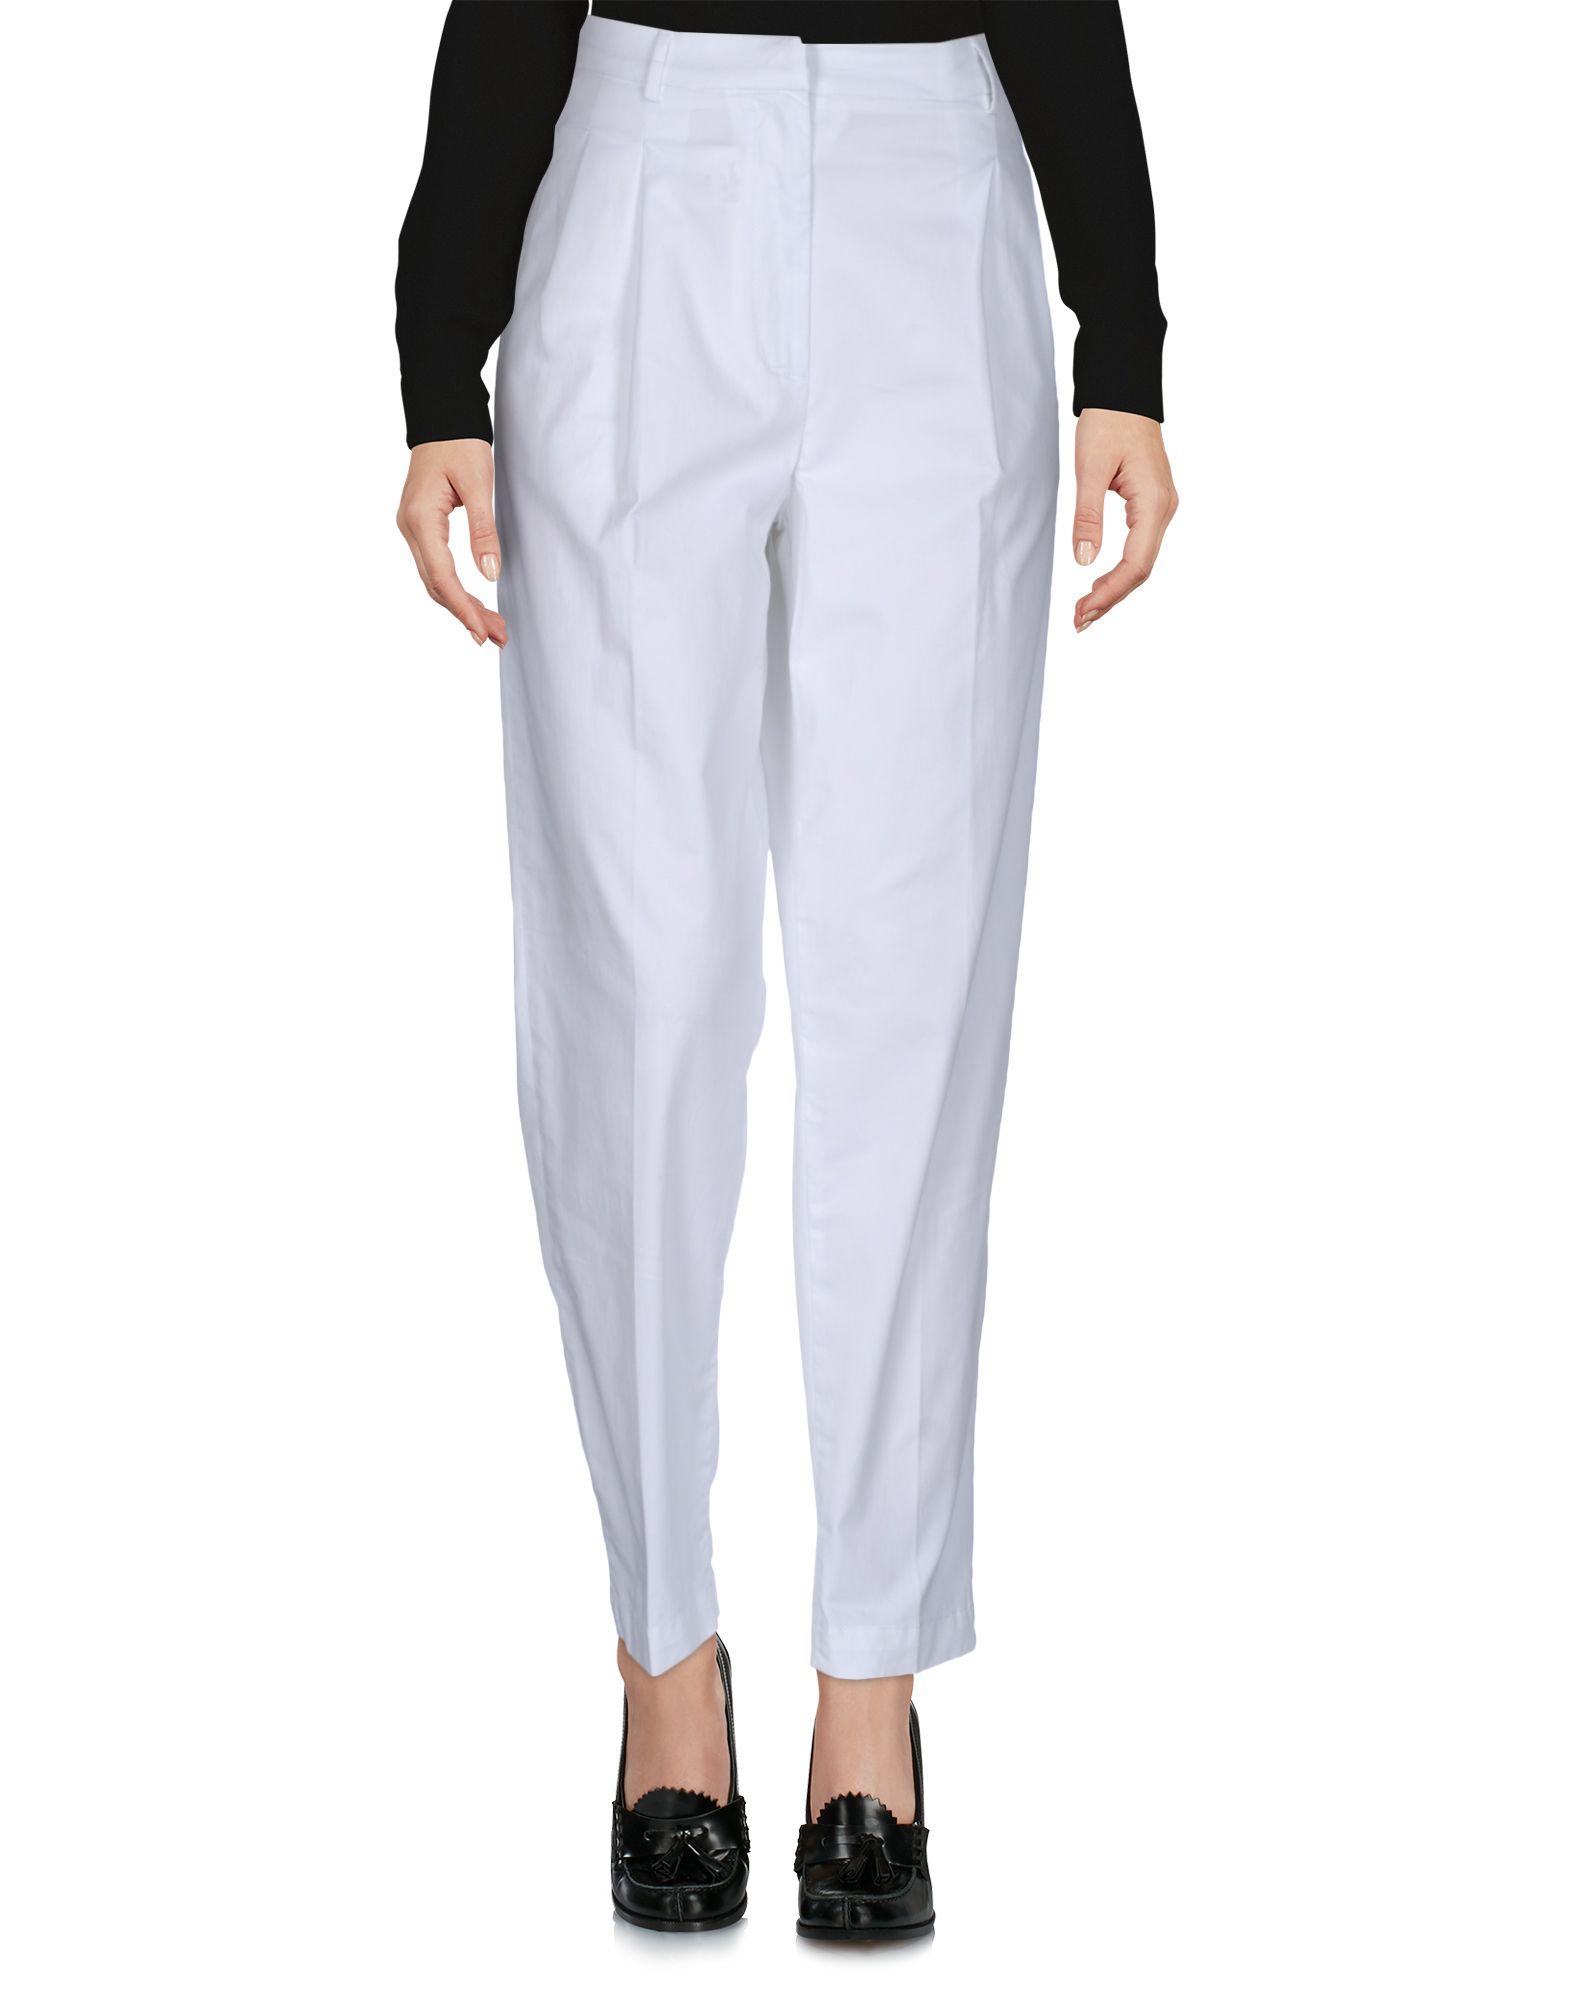 ATELIER ARCHIVIO | ATELIER ARCHIVIO Casual pants 13059599 | Goxip